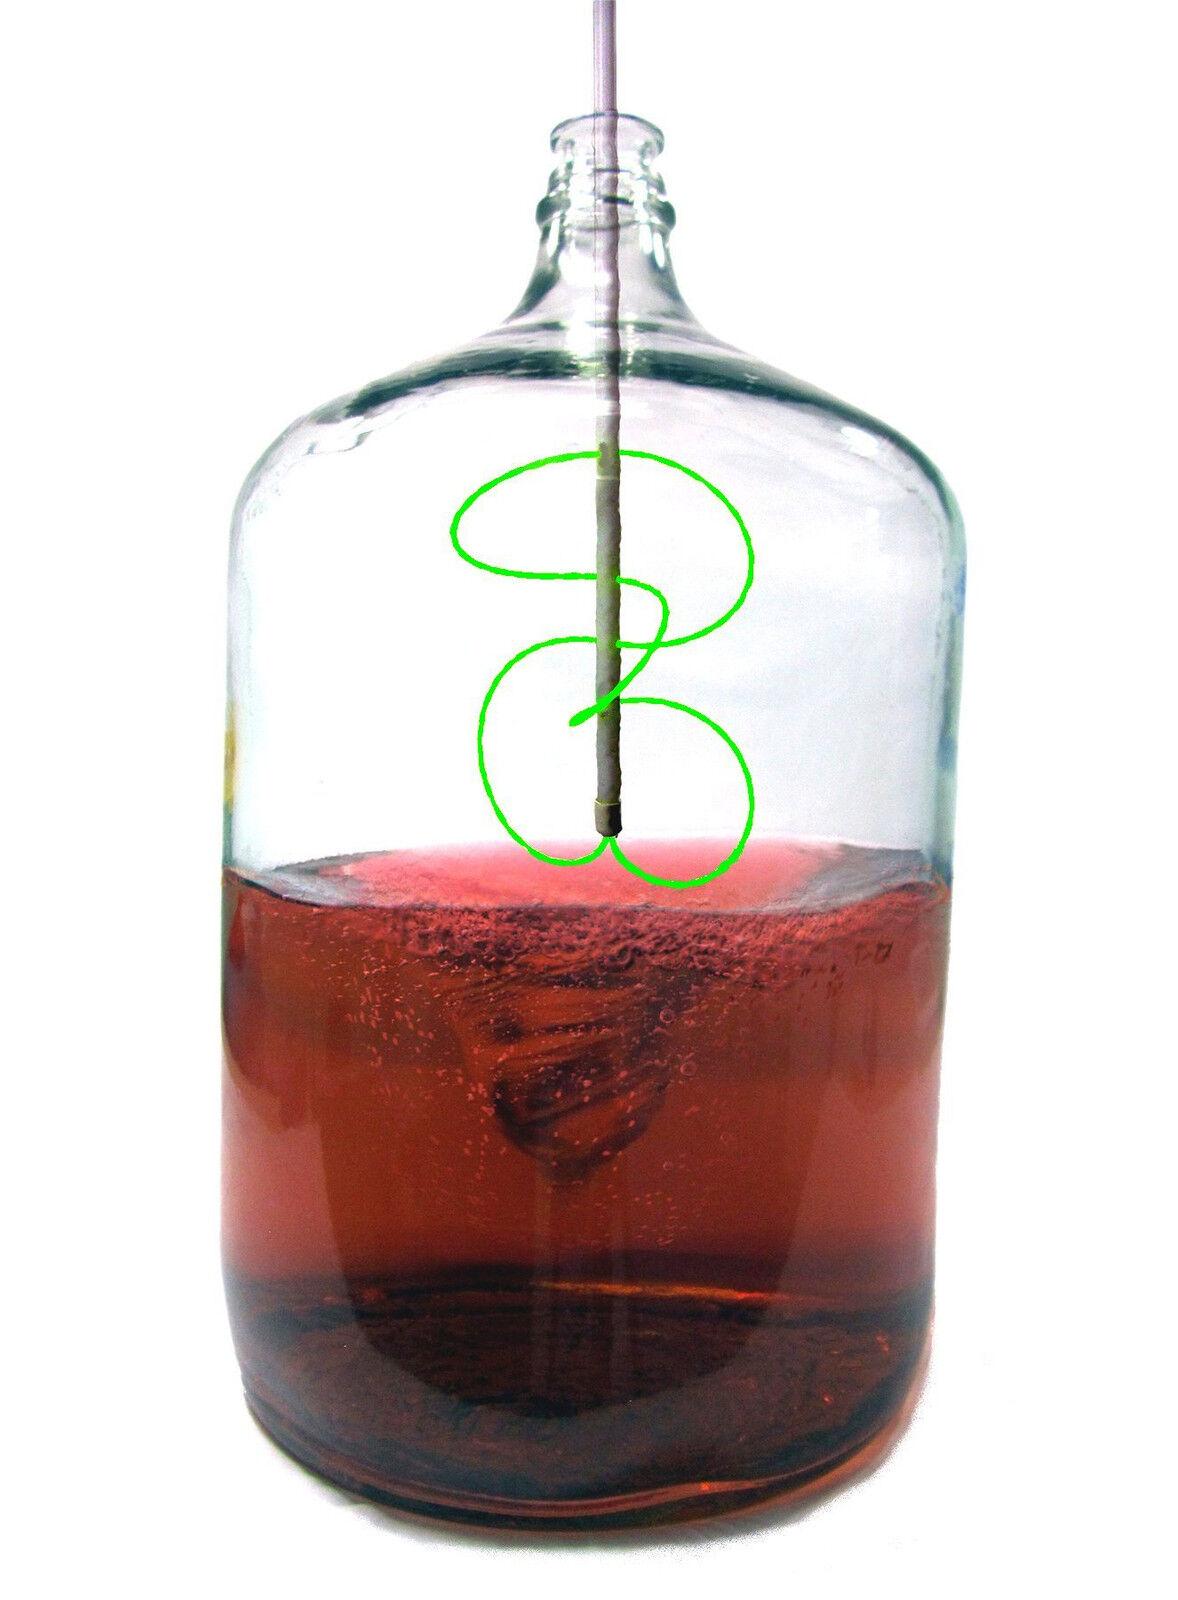 $14.95 - Clean Bottle Express™ Wine/Beer DeGasser